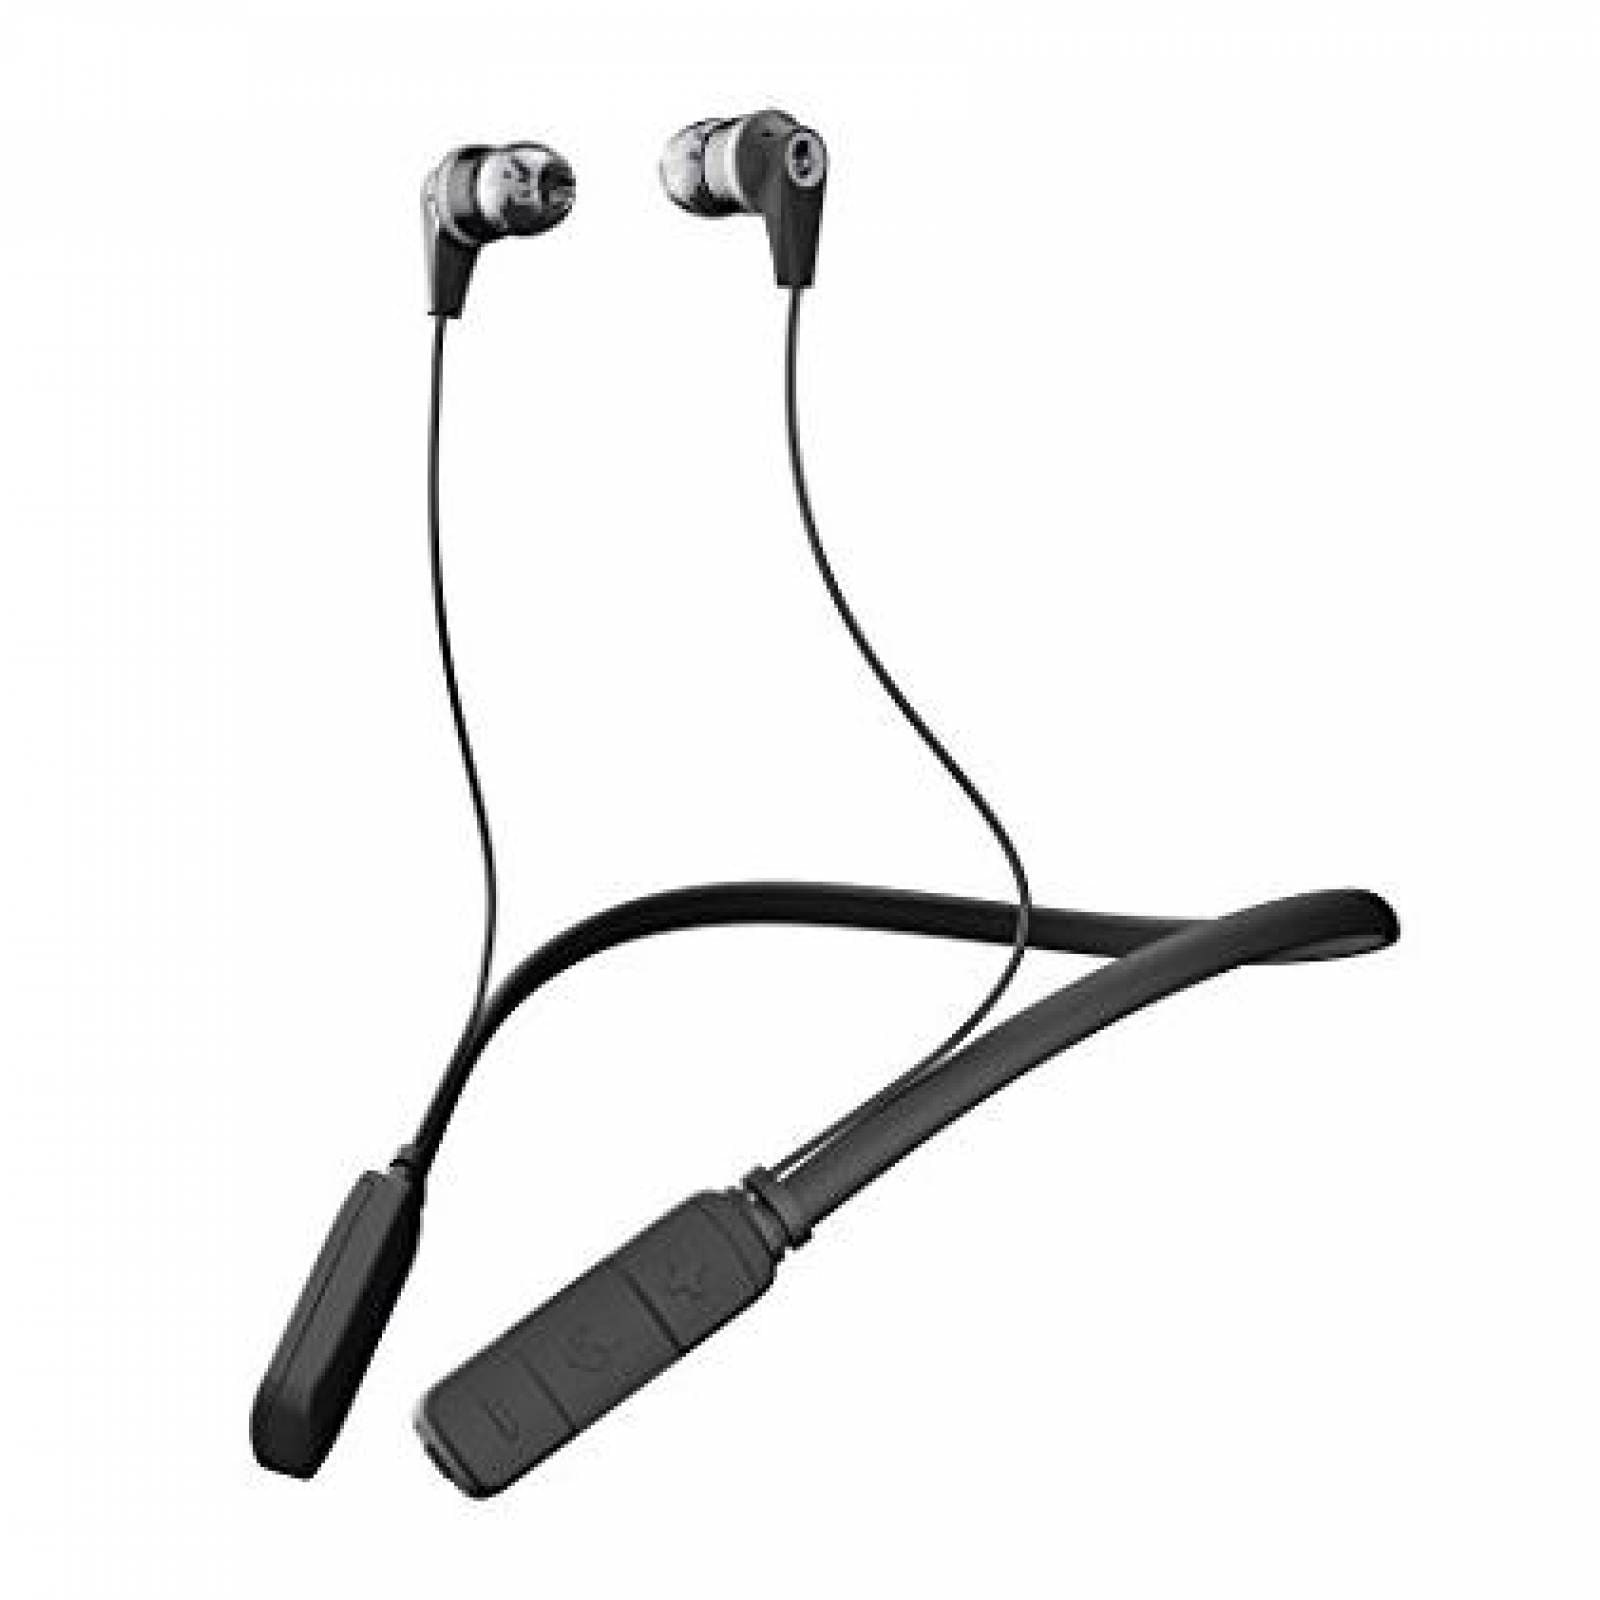 Audifonos Skullcandy Inkd Bluetooth Negro con gris S2IKW-J509